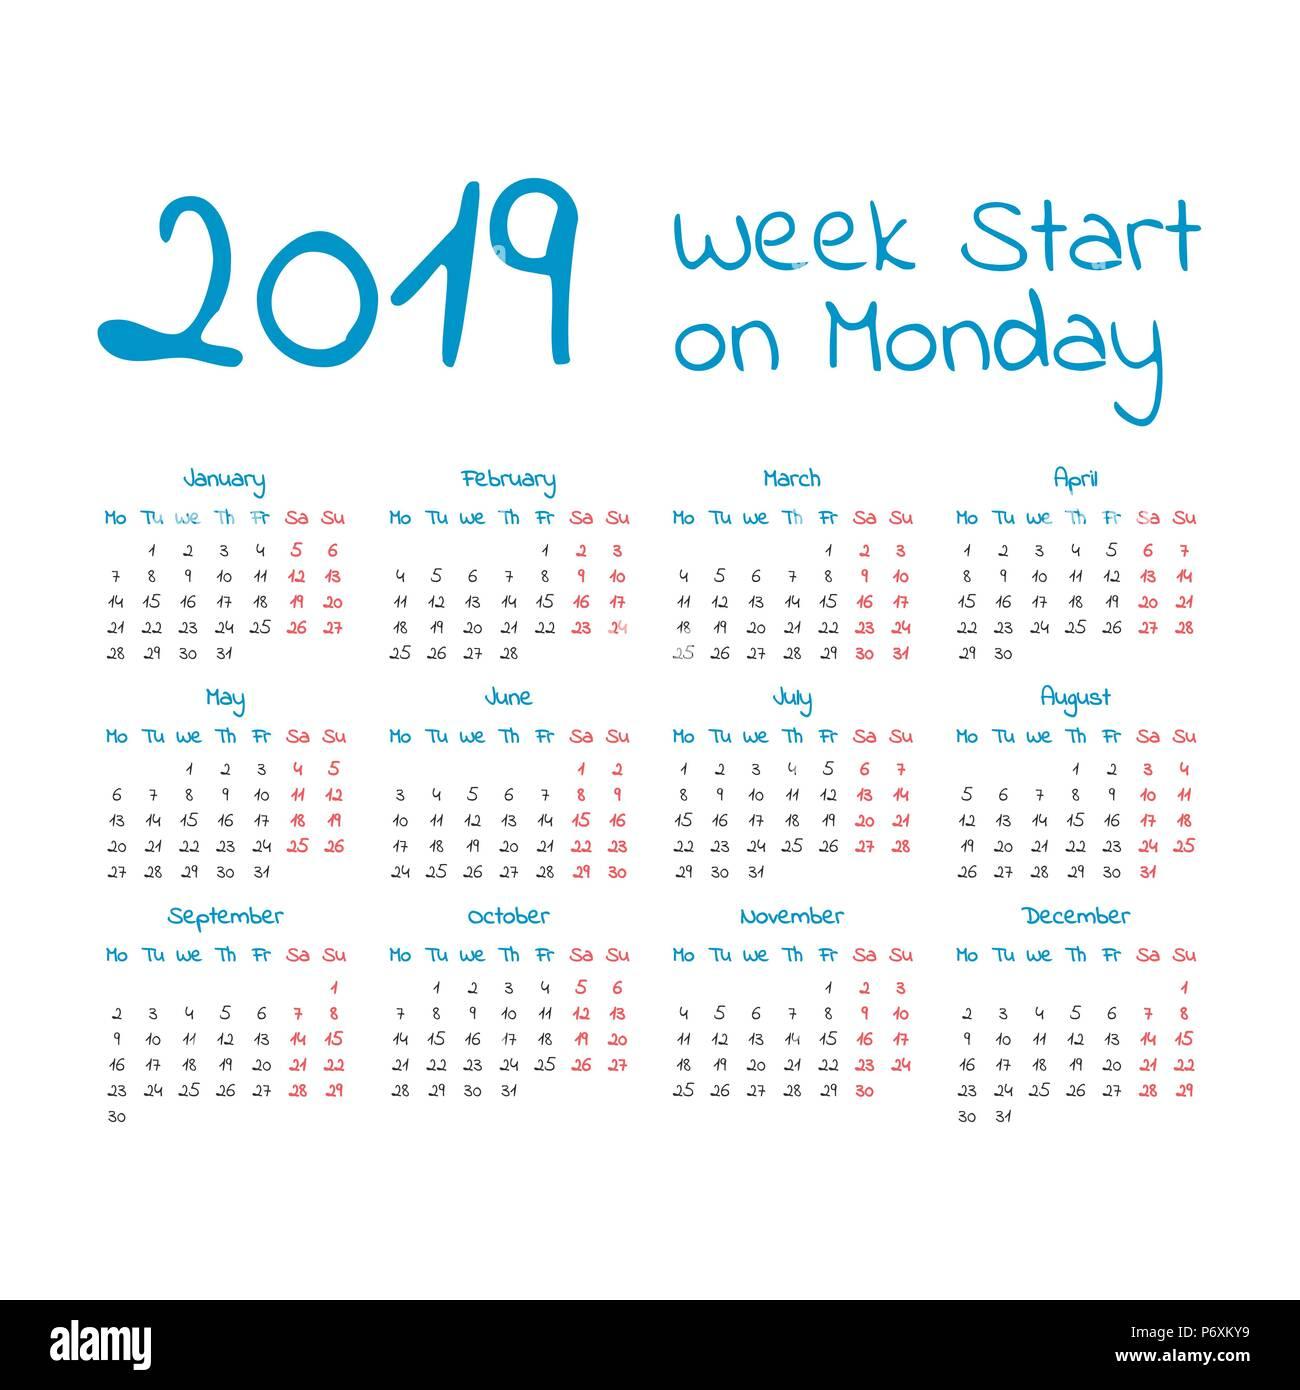 5 Year Calendar Starting 2019 Simple 2019 year calendar, week starts on Monday Stock Vector Art